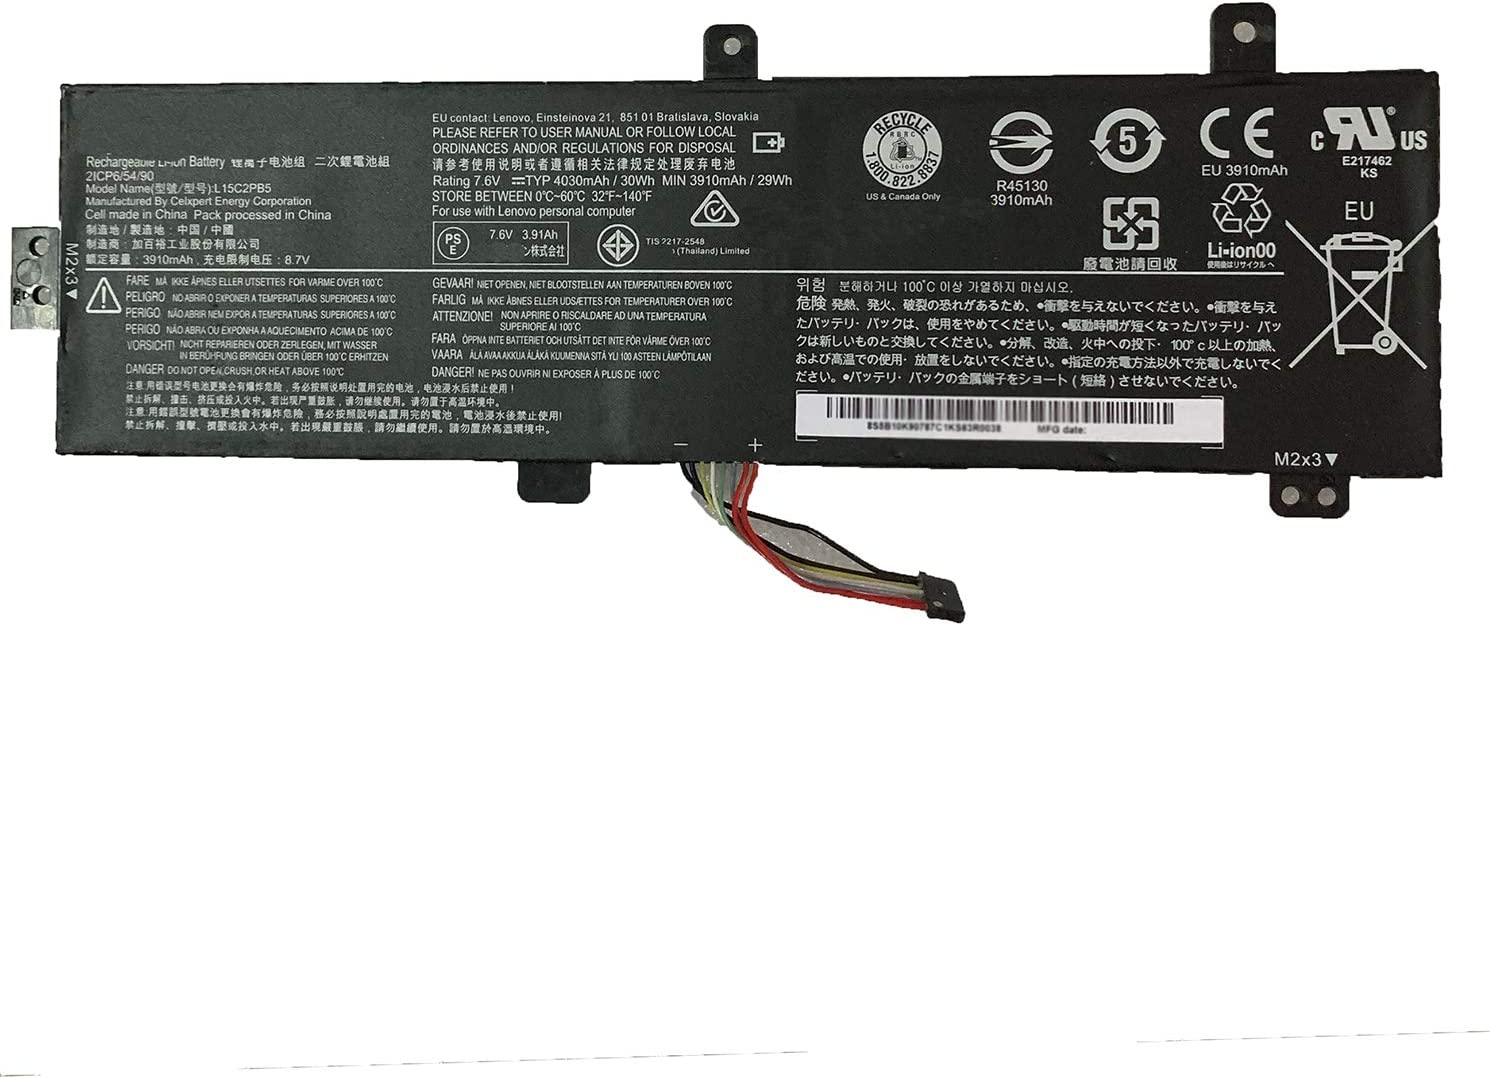 Dentsing L15C2PB5 (7.6V 30Wh/3900mAh 2-Cells) Laptop Battery Compatible with Lenovo IdeaPad 510-15IKB 510-15ISK 310-15ABR 310-15IK Series Notebook L15C2PB3 L15C2PB7 L15S2TB0 L15L2PB4 L15M2PB3 L15M2PB5